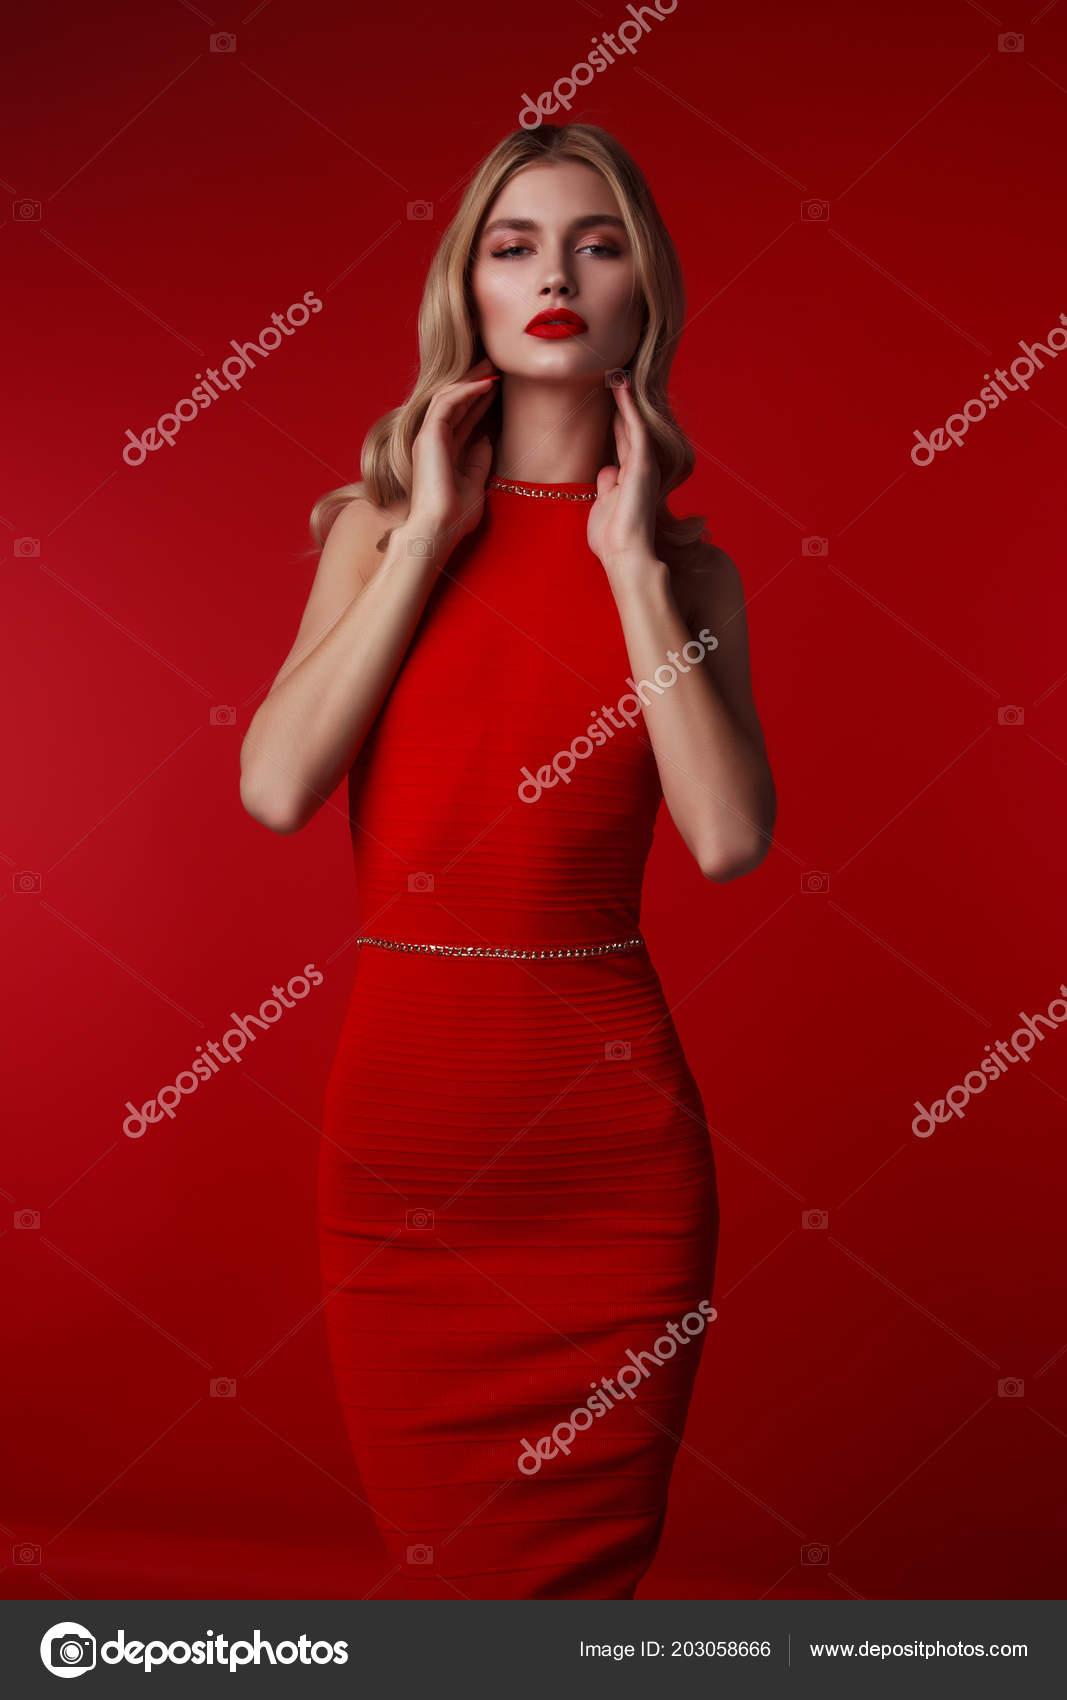 30e95a2e77e51a Mode Foto Van Een Mooie Elegante Blonde Vrouw Een Lange — Stockfoto ...